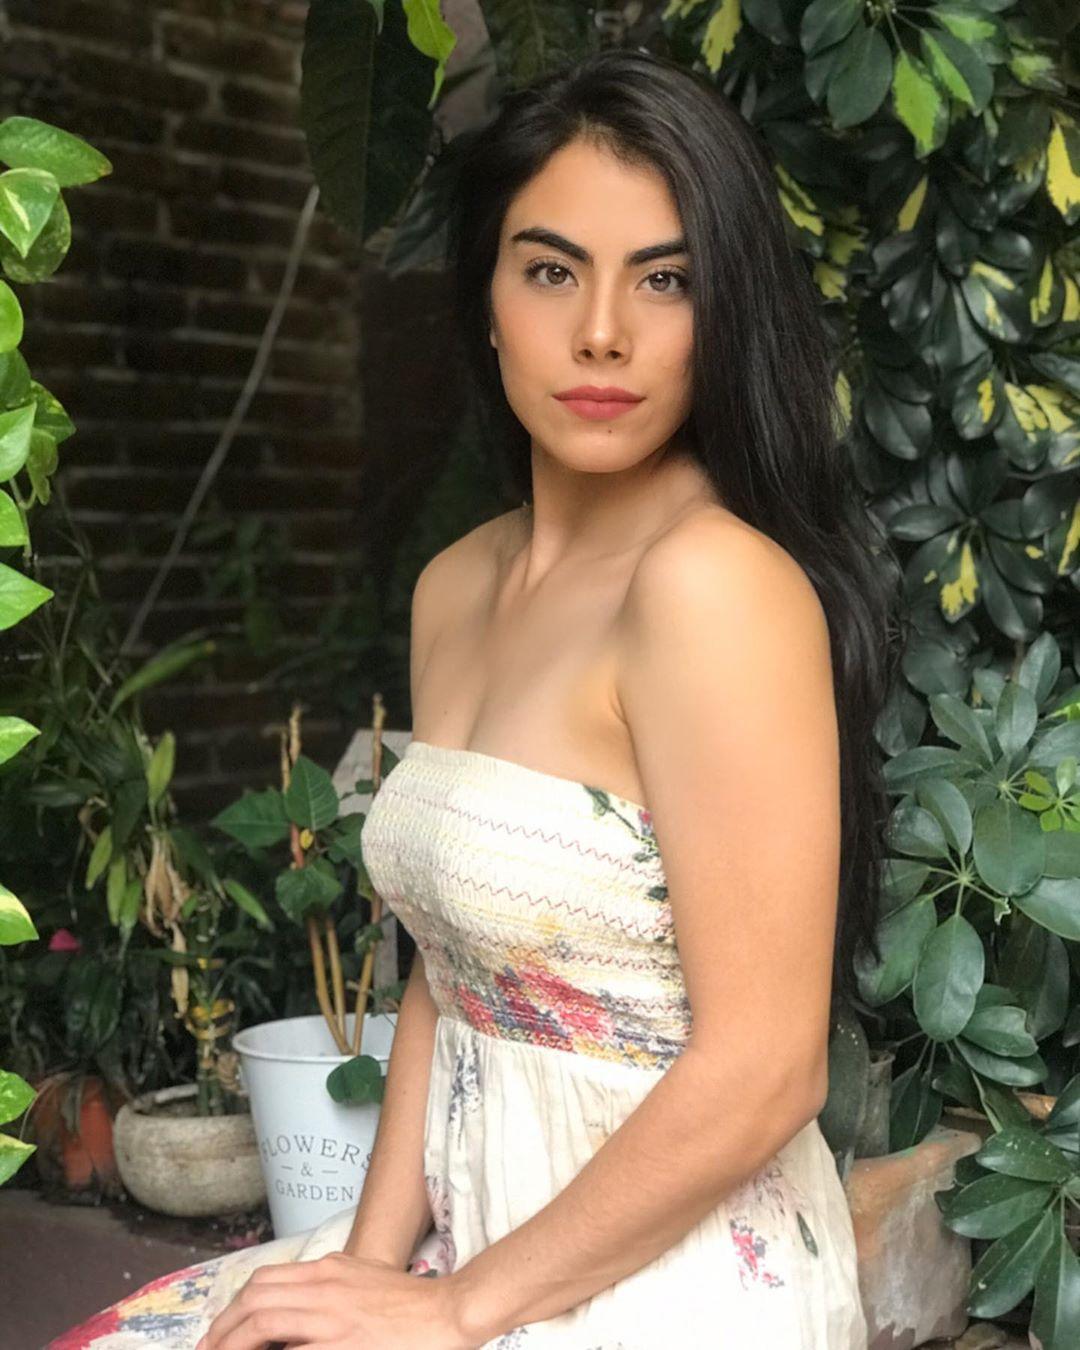 candidatas a miss mexico 2020, final: 31 oct. - Página 2 UwJSGj